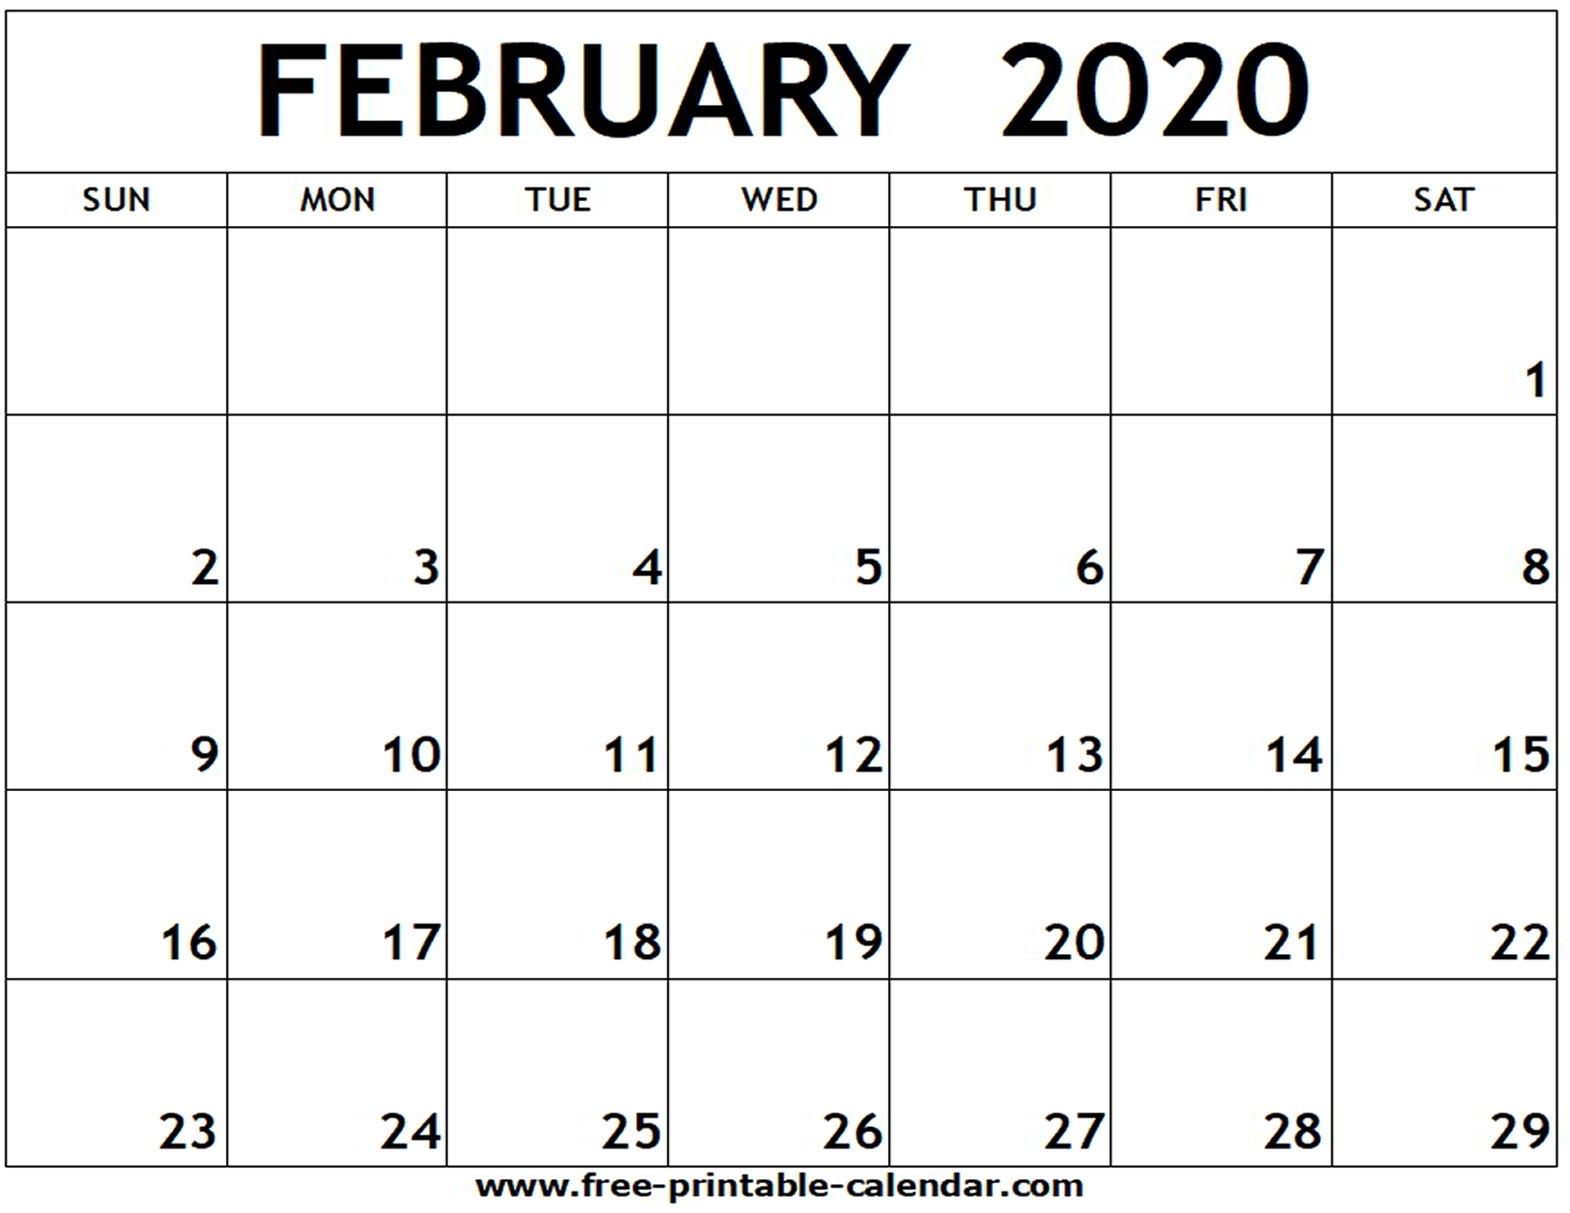 February 2020 Printable Calendar - Free-Printable-Calendar with regard to Free 2020 Printable Calendars Without Downloading